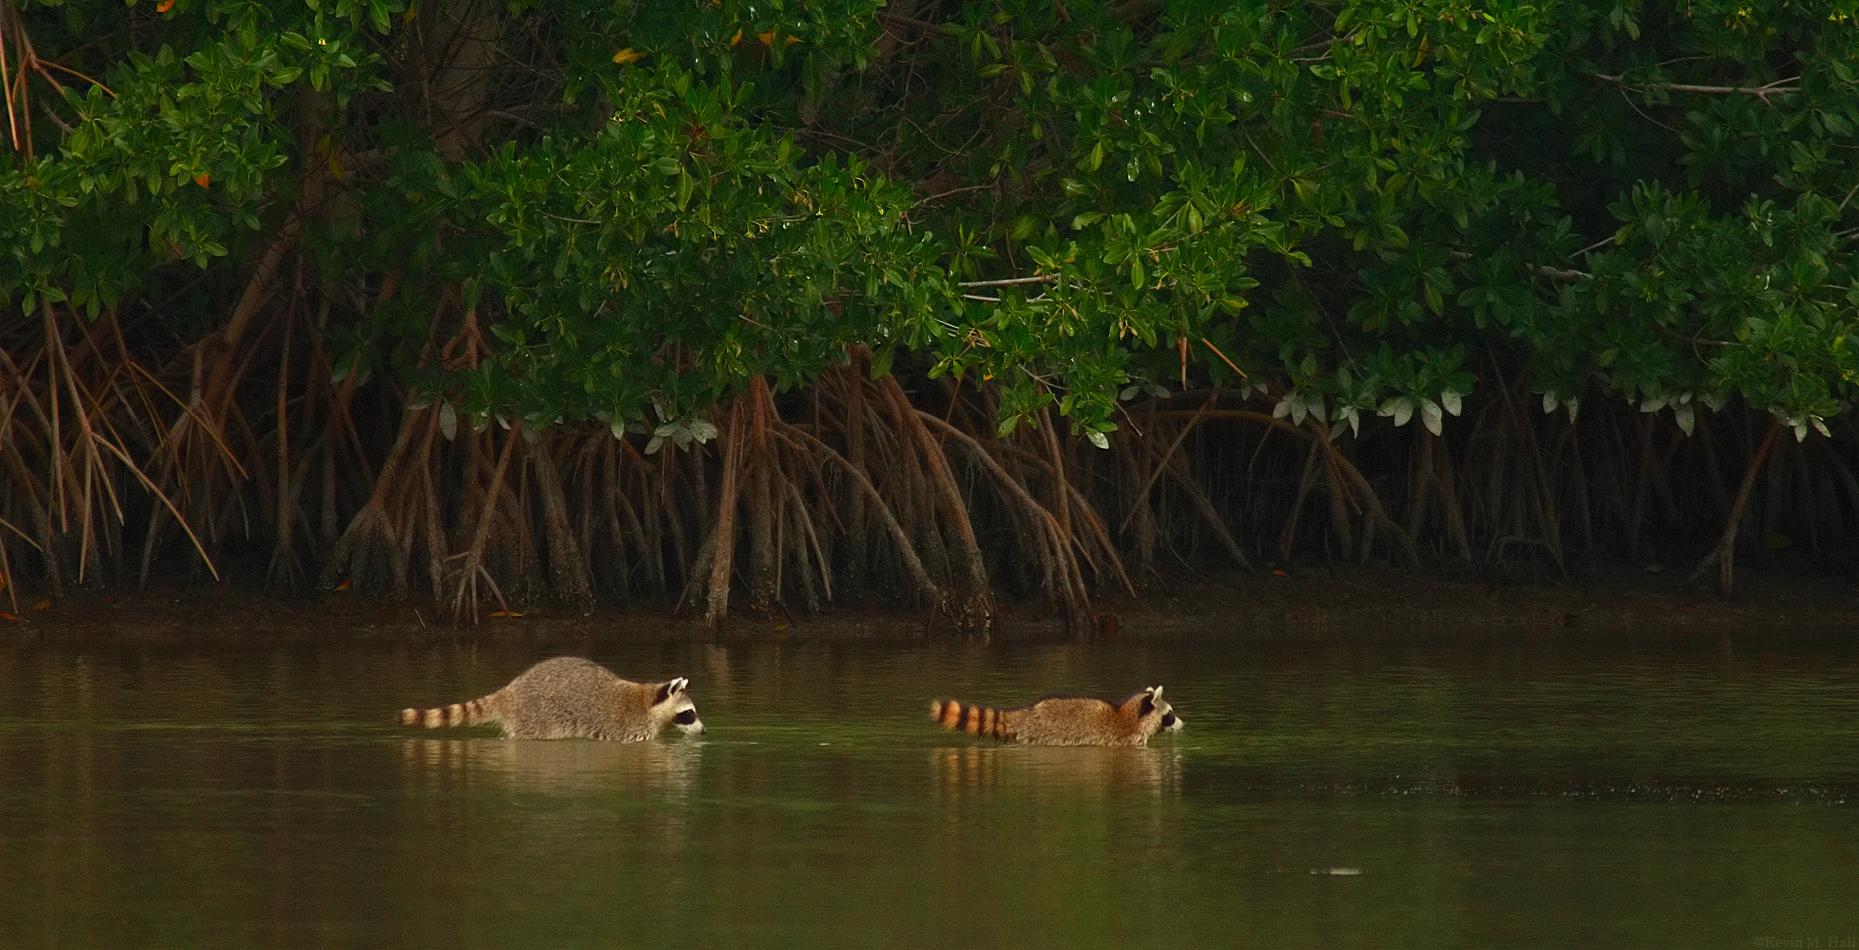 Raccoons in the Tidal Flat